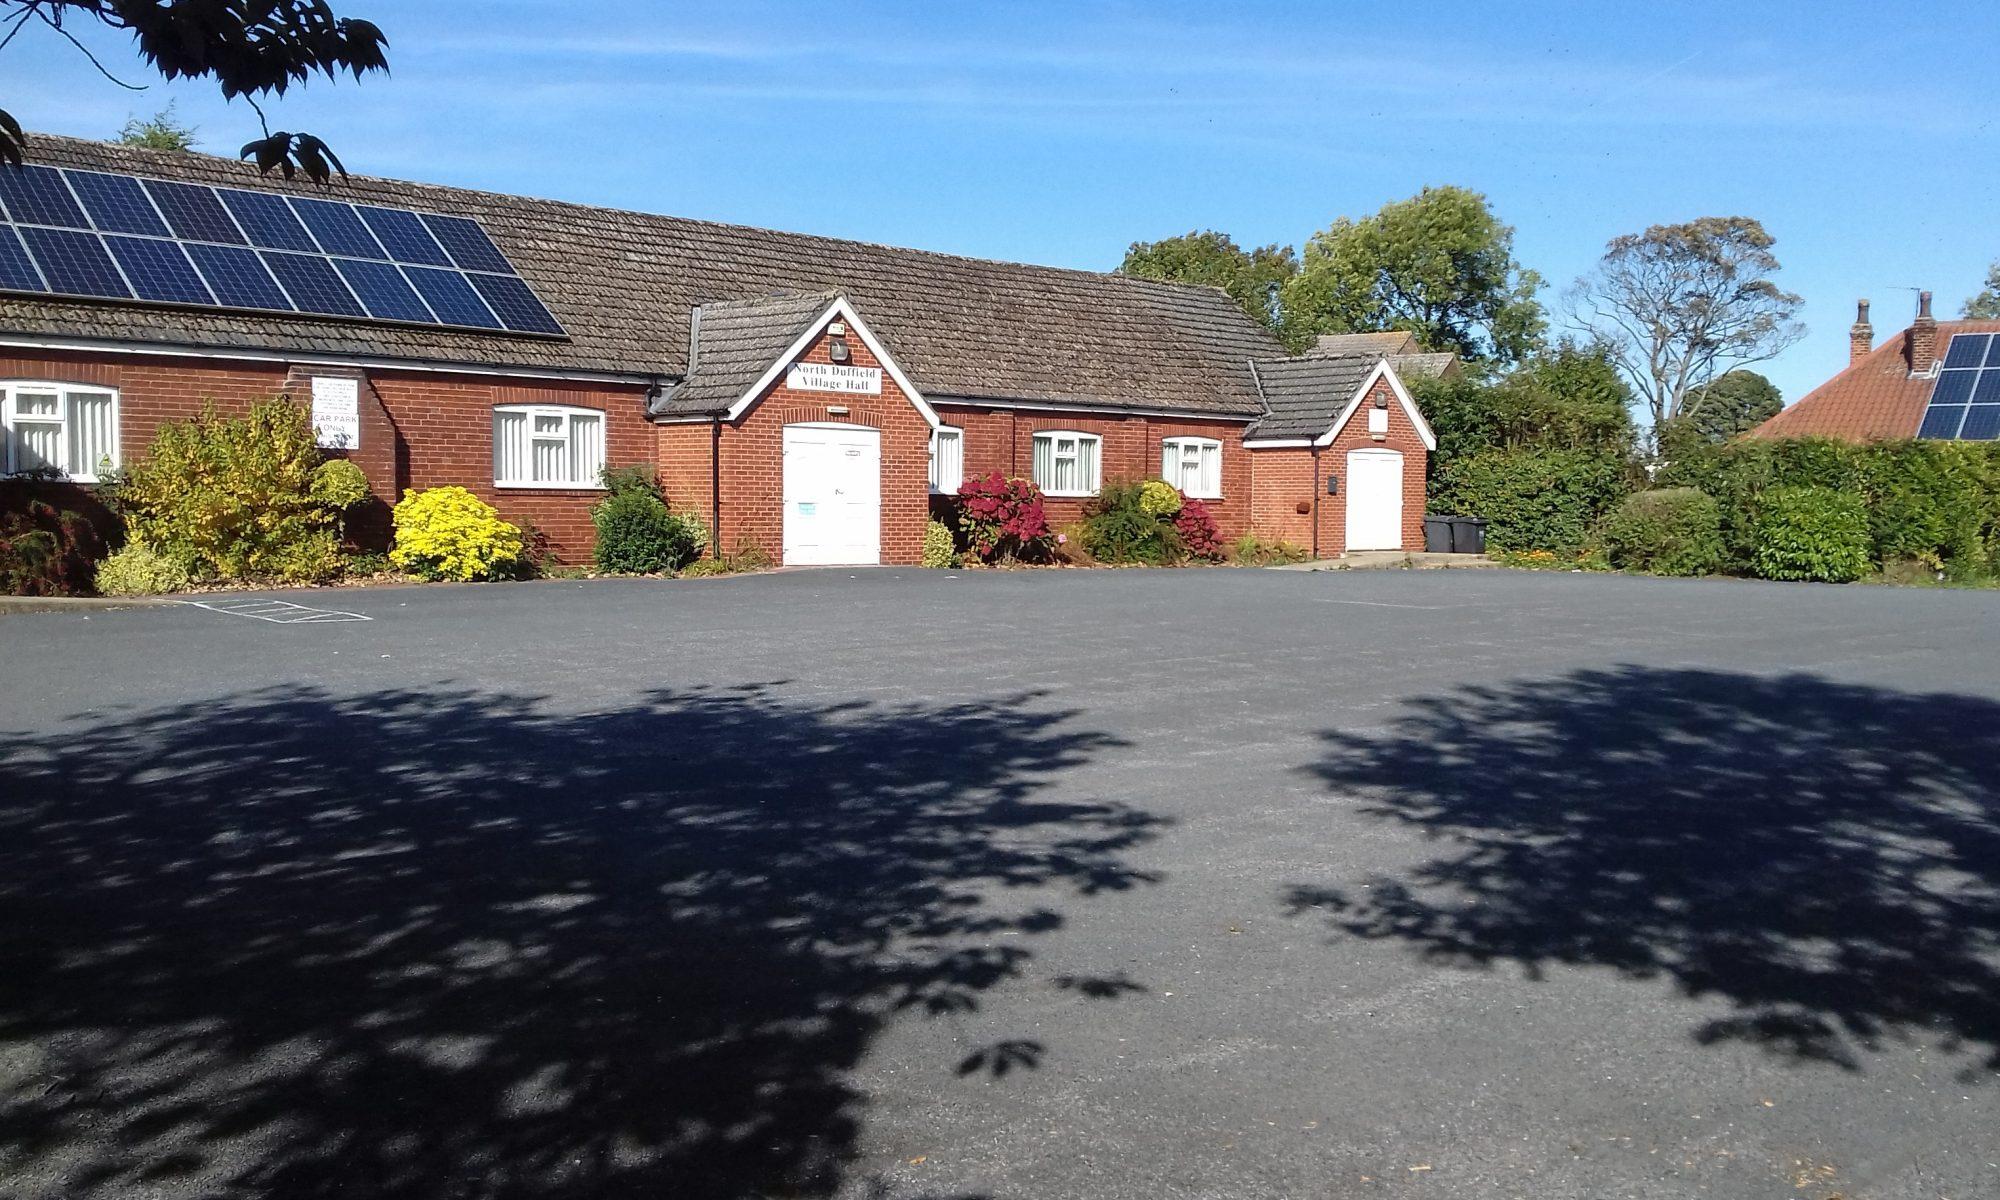 North Duffield Village Hall